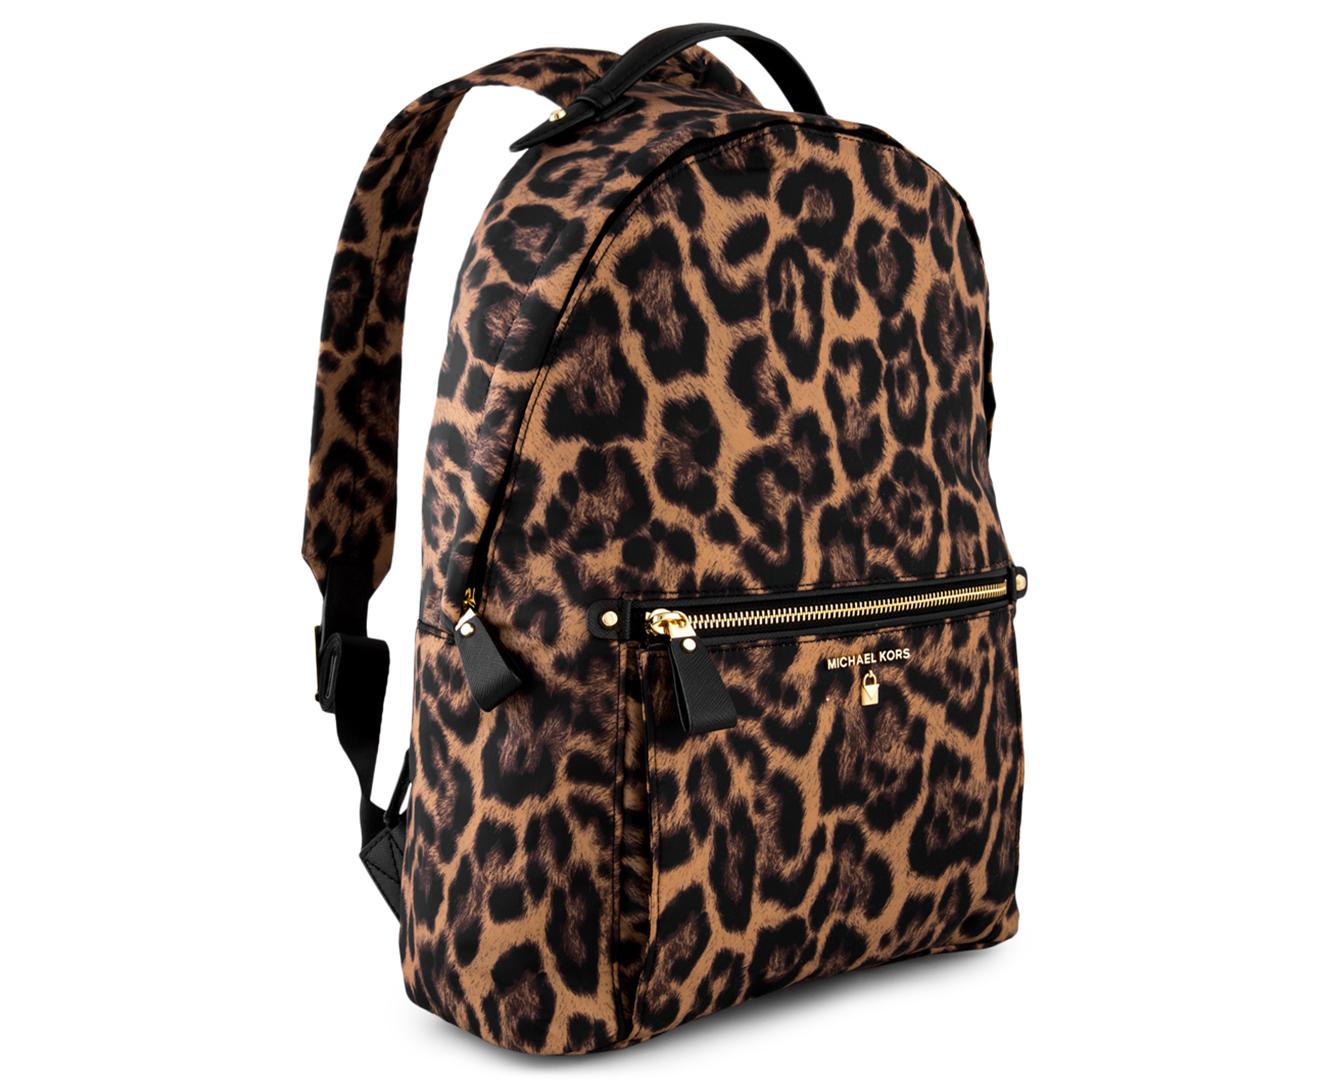 4892688aae7814 Michael Kors Kelsey Backpack - Butterscotch | Catch.com.au